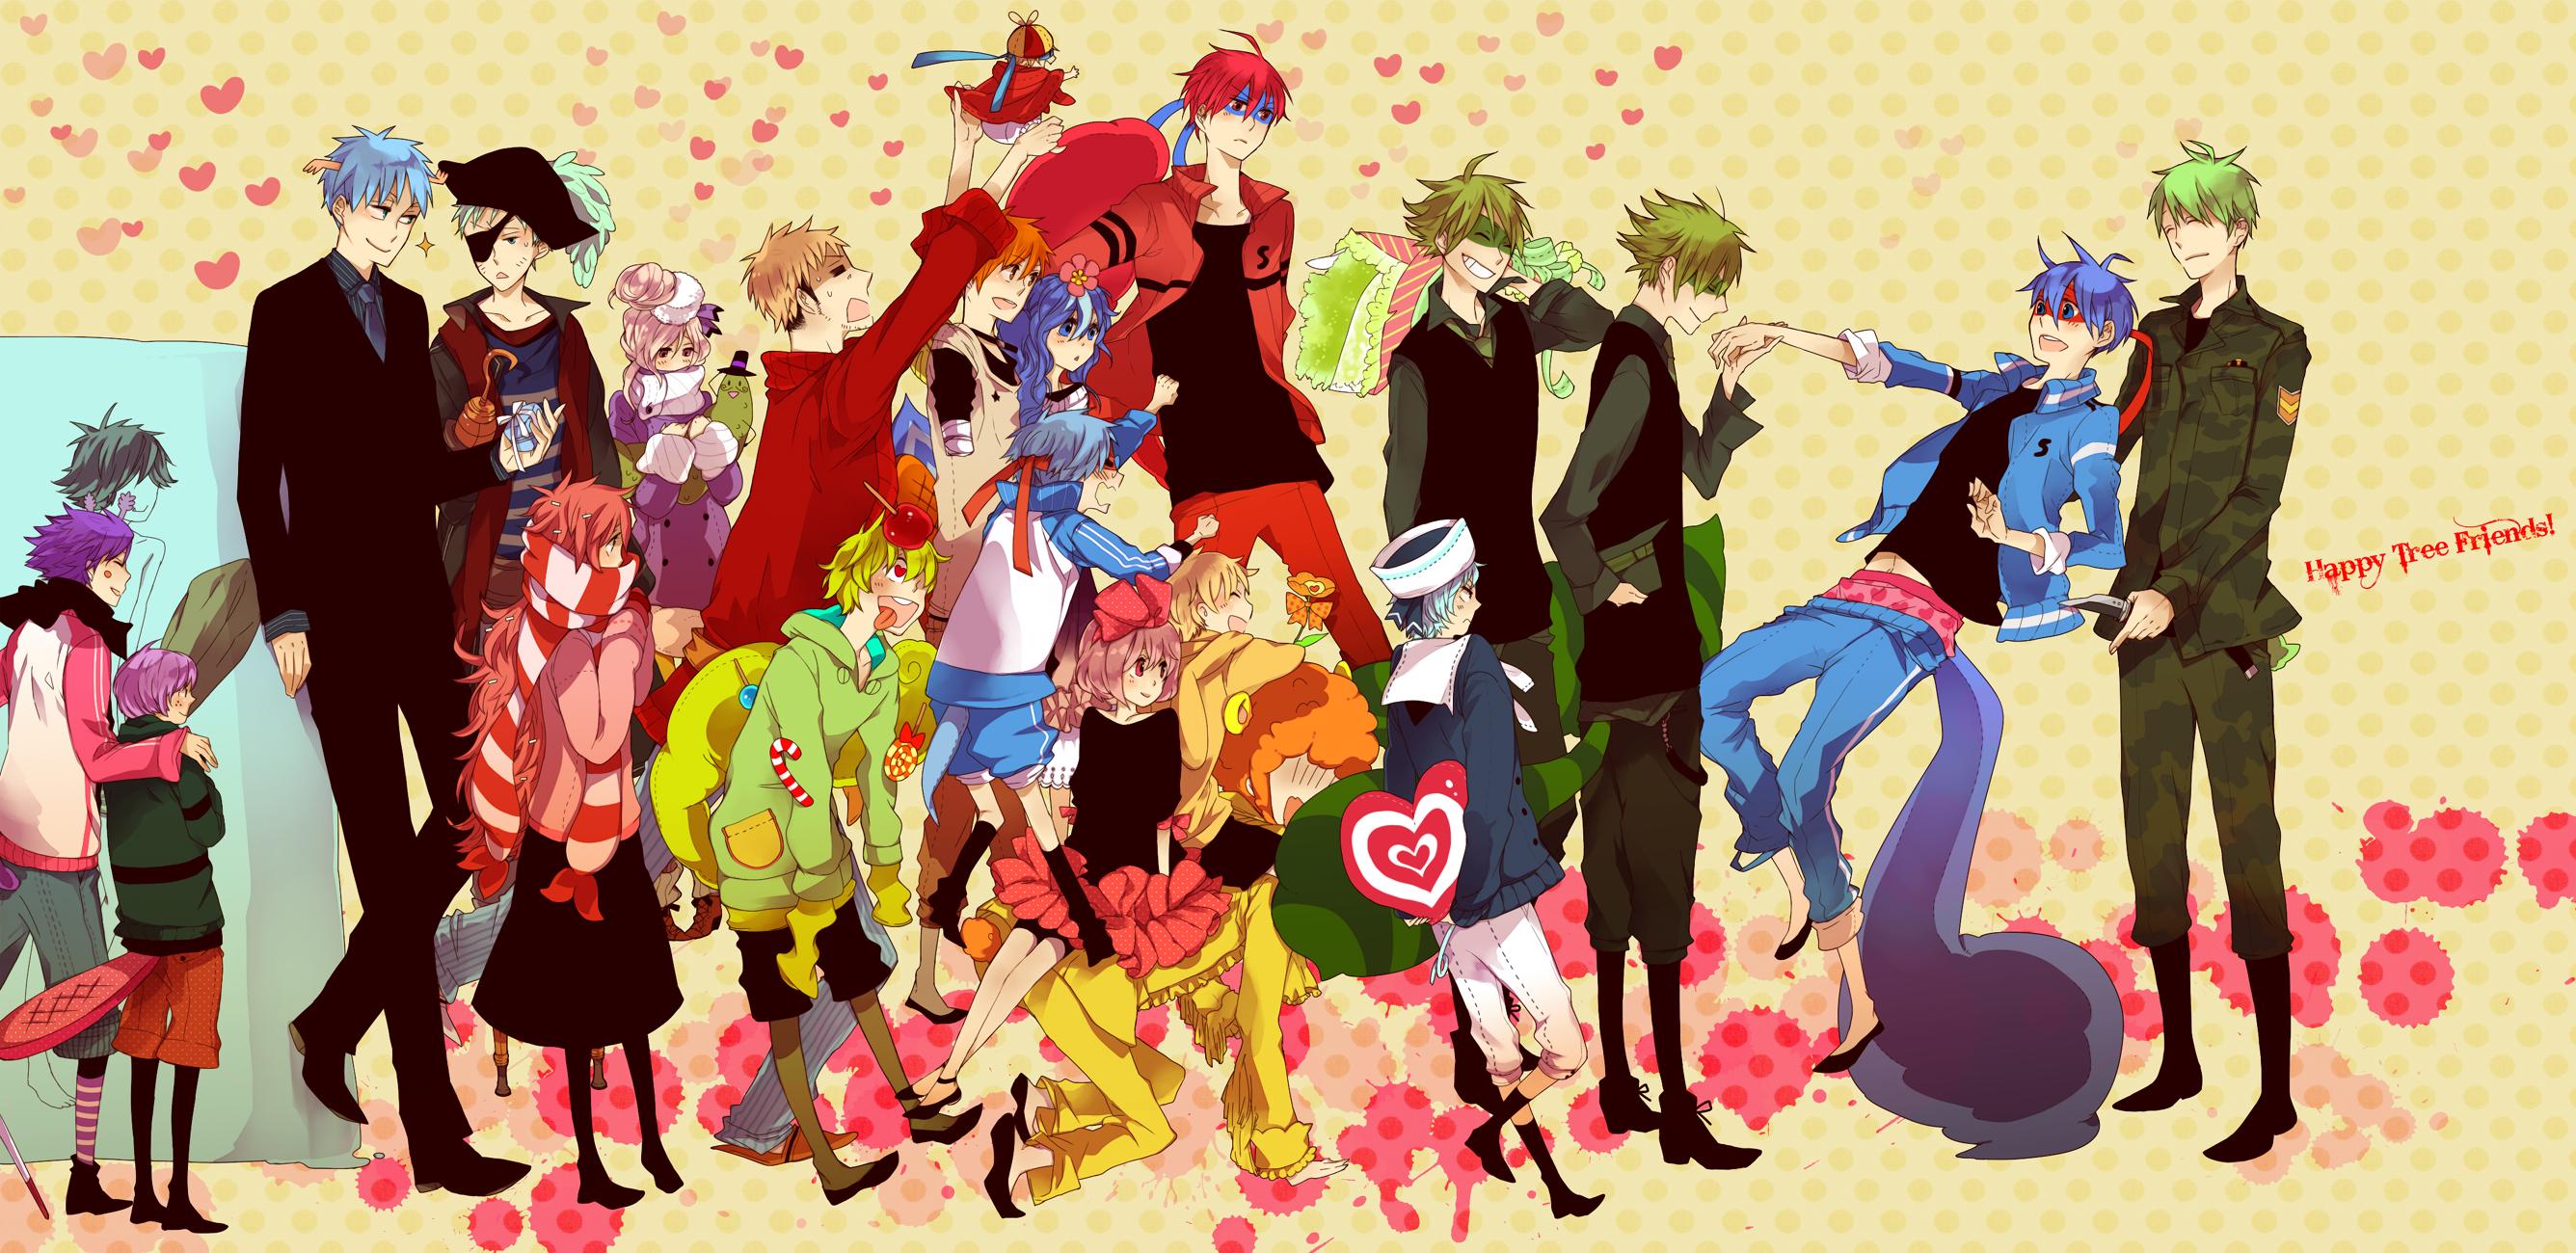 happy tree friends anime - photo #18